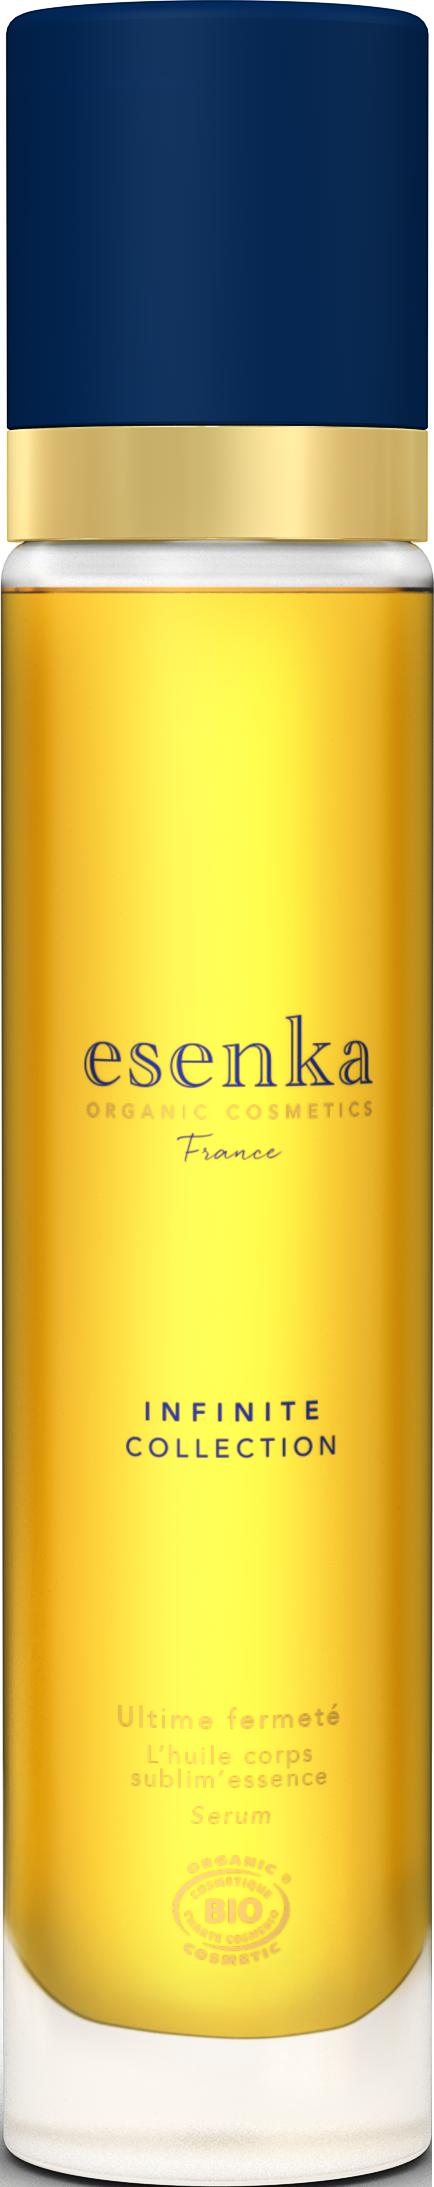 Esenka Sublim'essence Body Oil 100ml